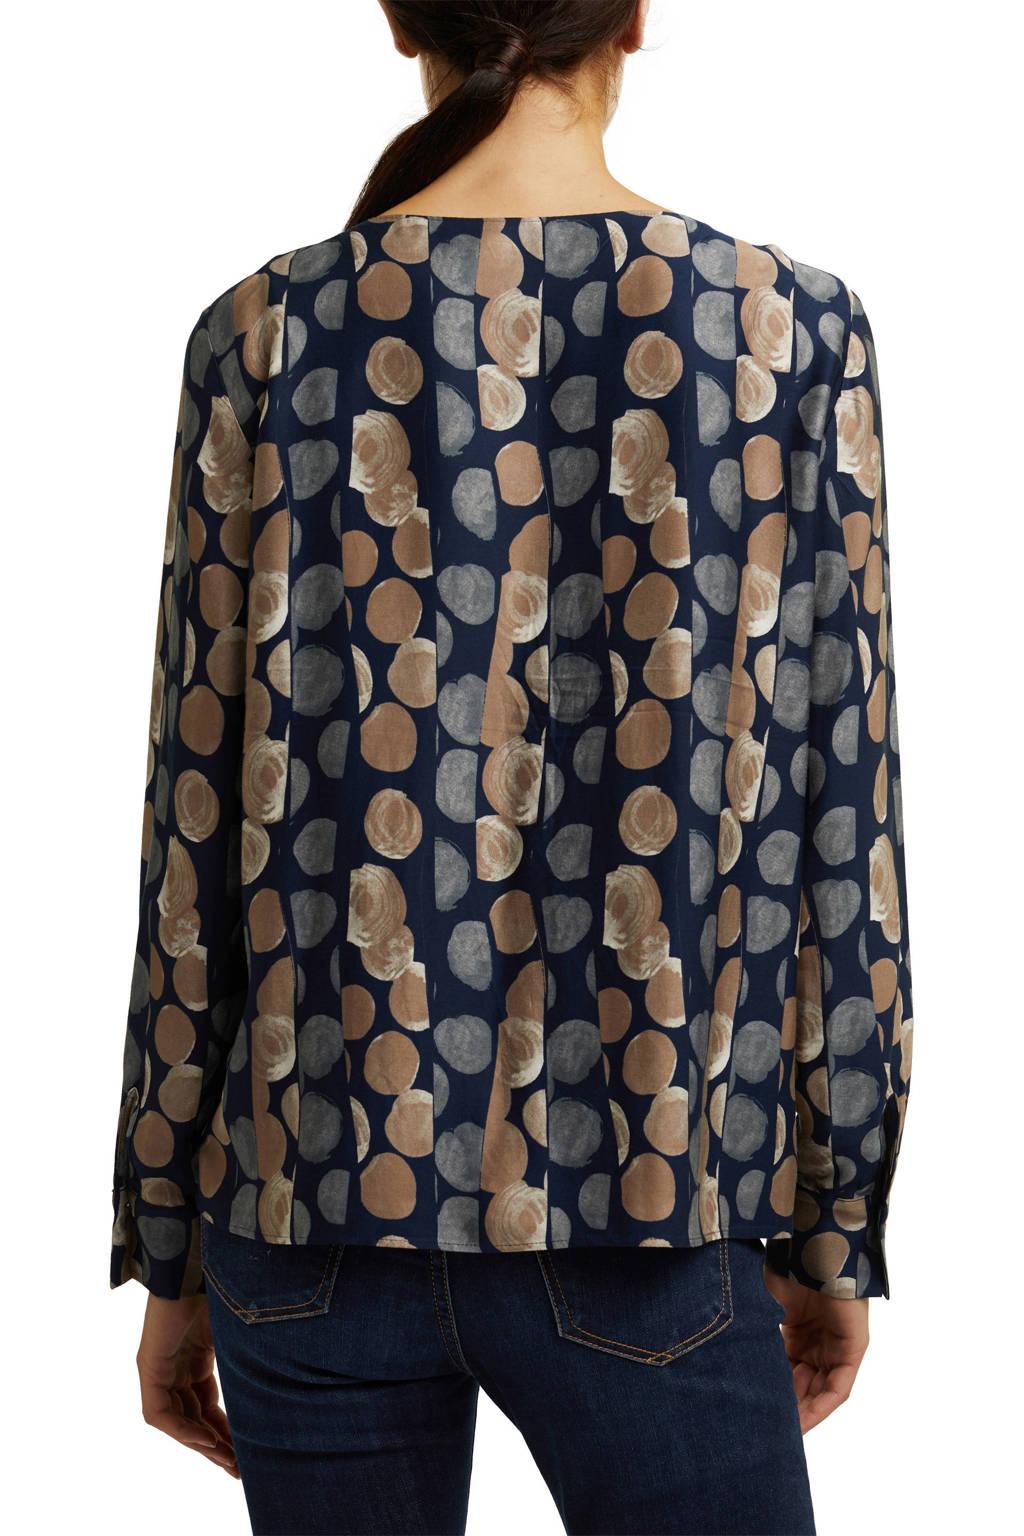 ESPRIT Women Collection top met all over print blauw/zand, Blauw/zand